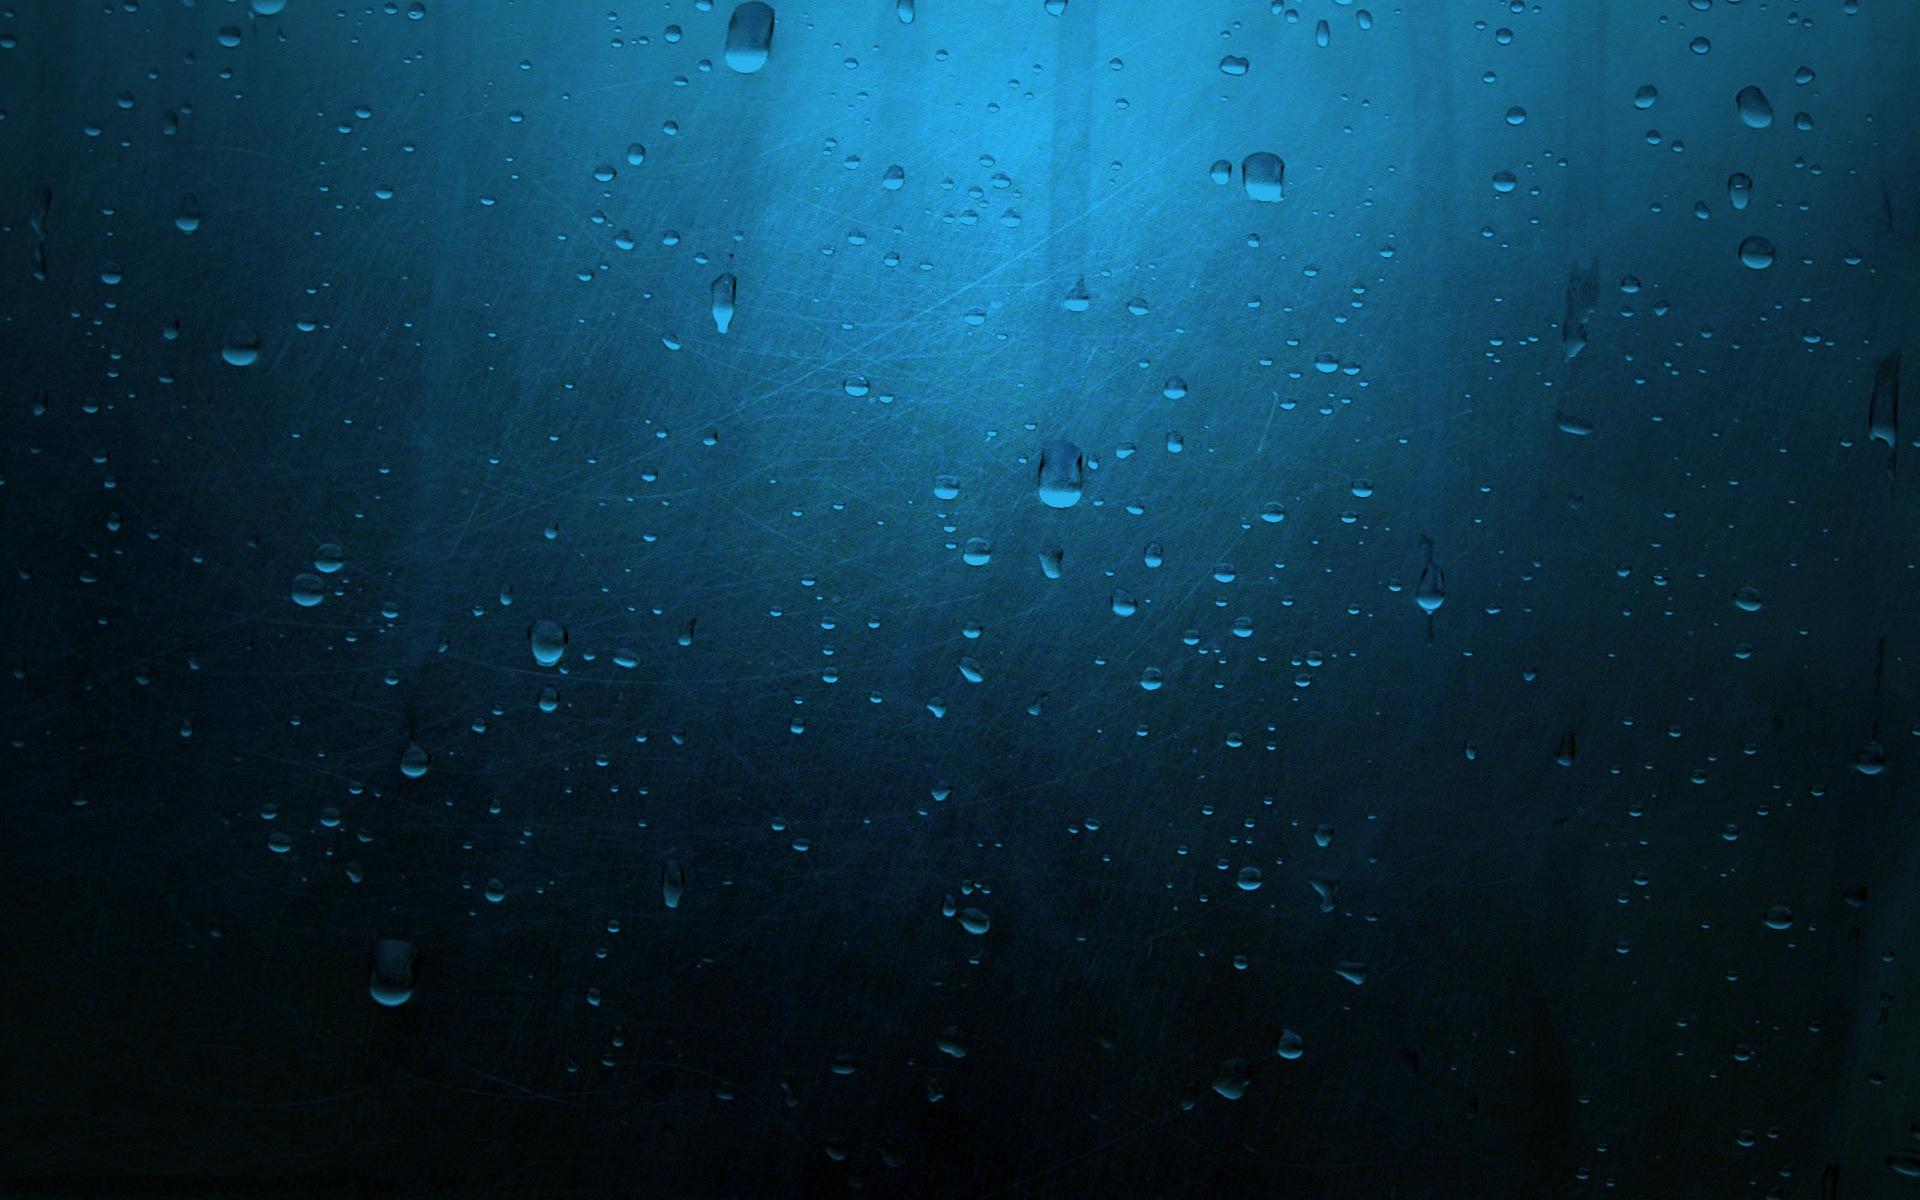 Water Droplets Scratched Blue Metal HD Wallpaper Wallsev 1920x1200